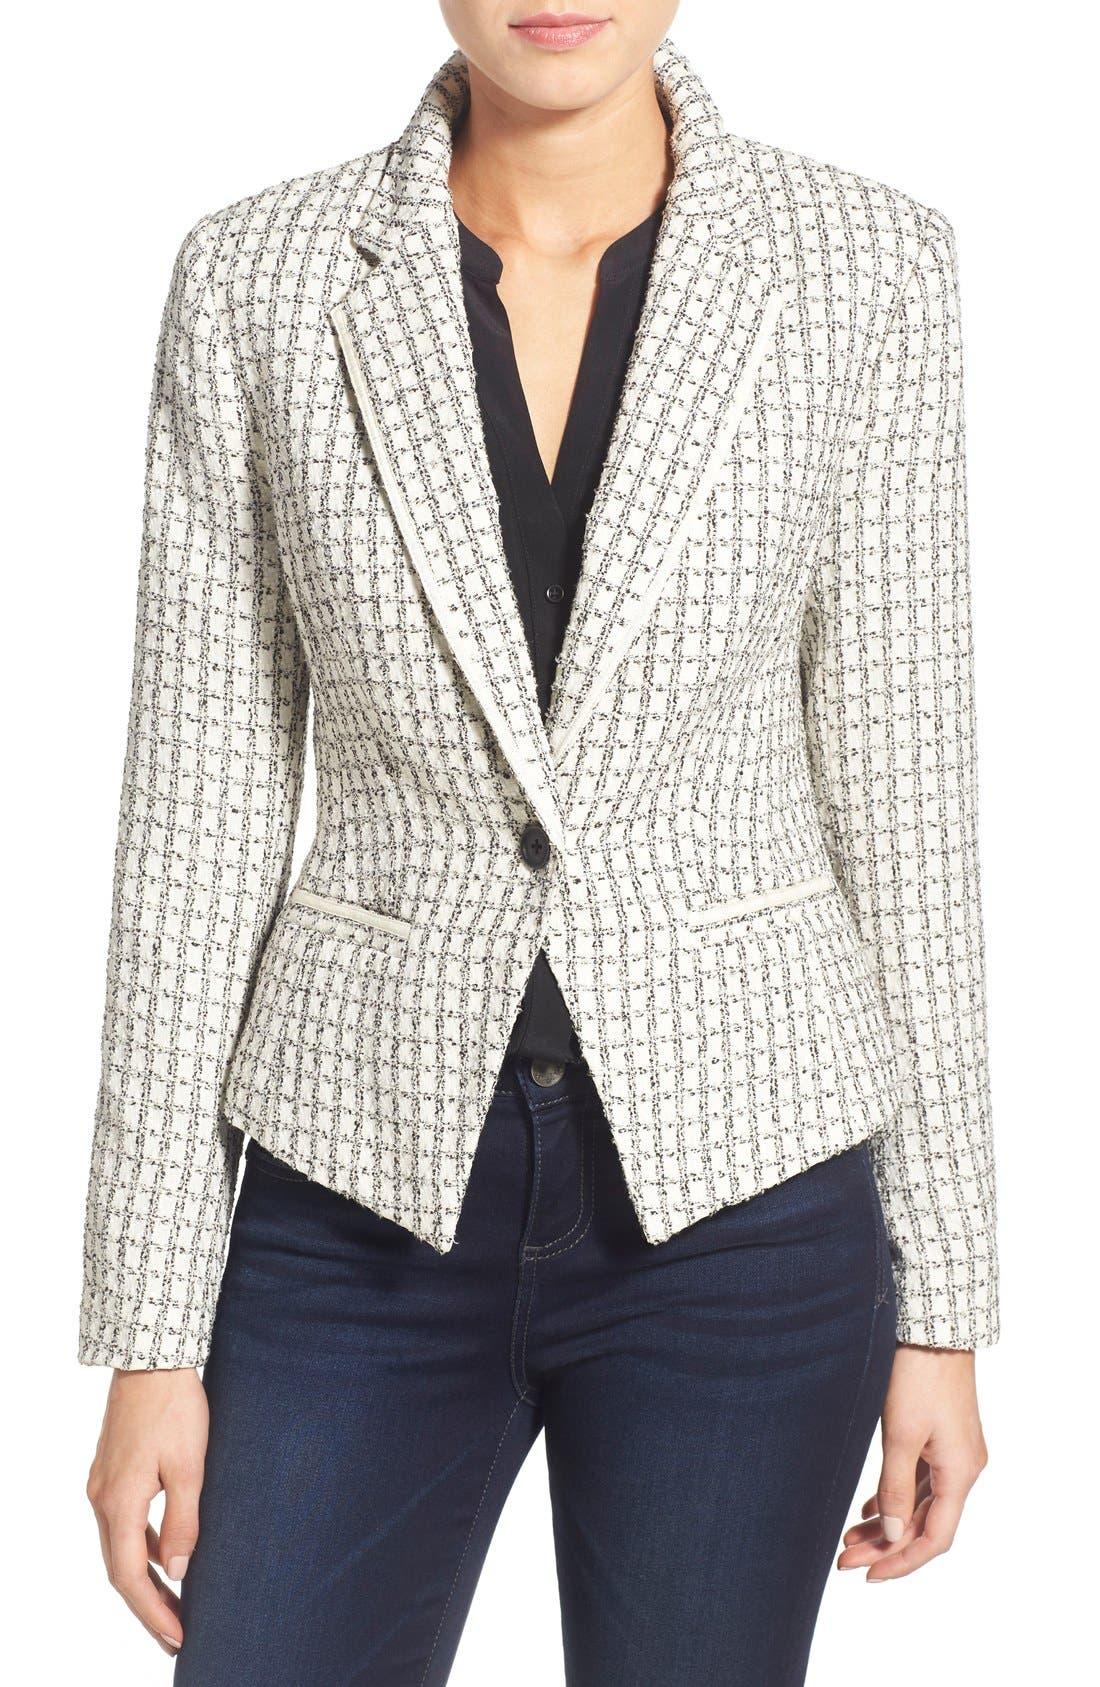 Alternate Image 1 Selected - Halogen® Textured One-Button Blazer (Regular & Petite)